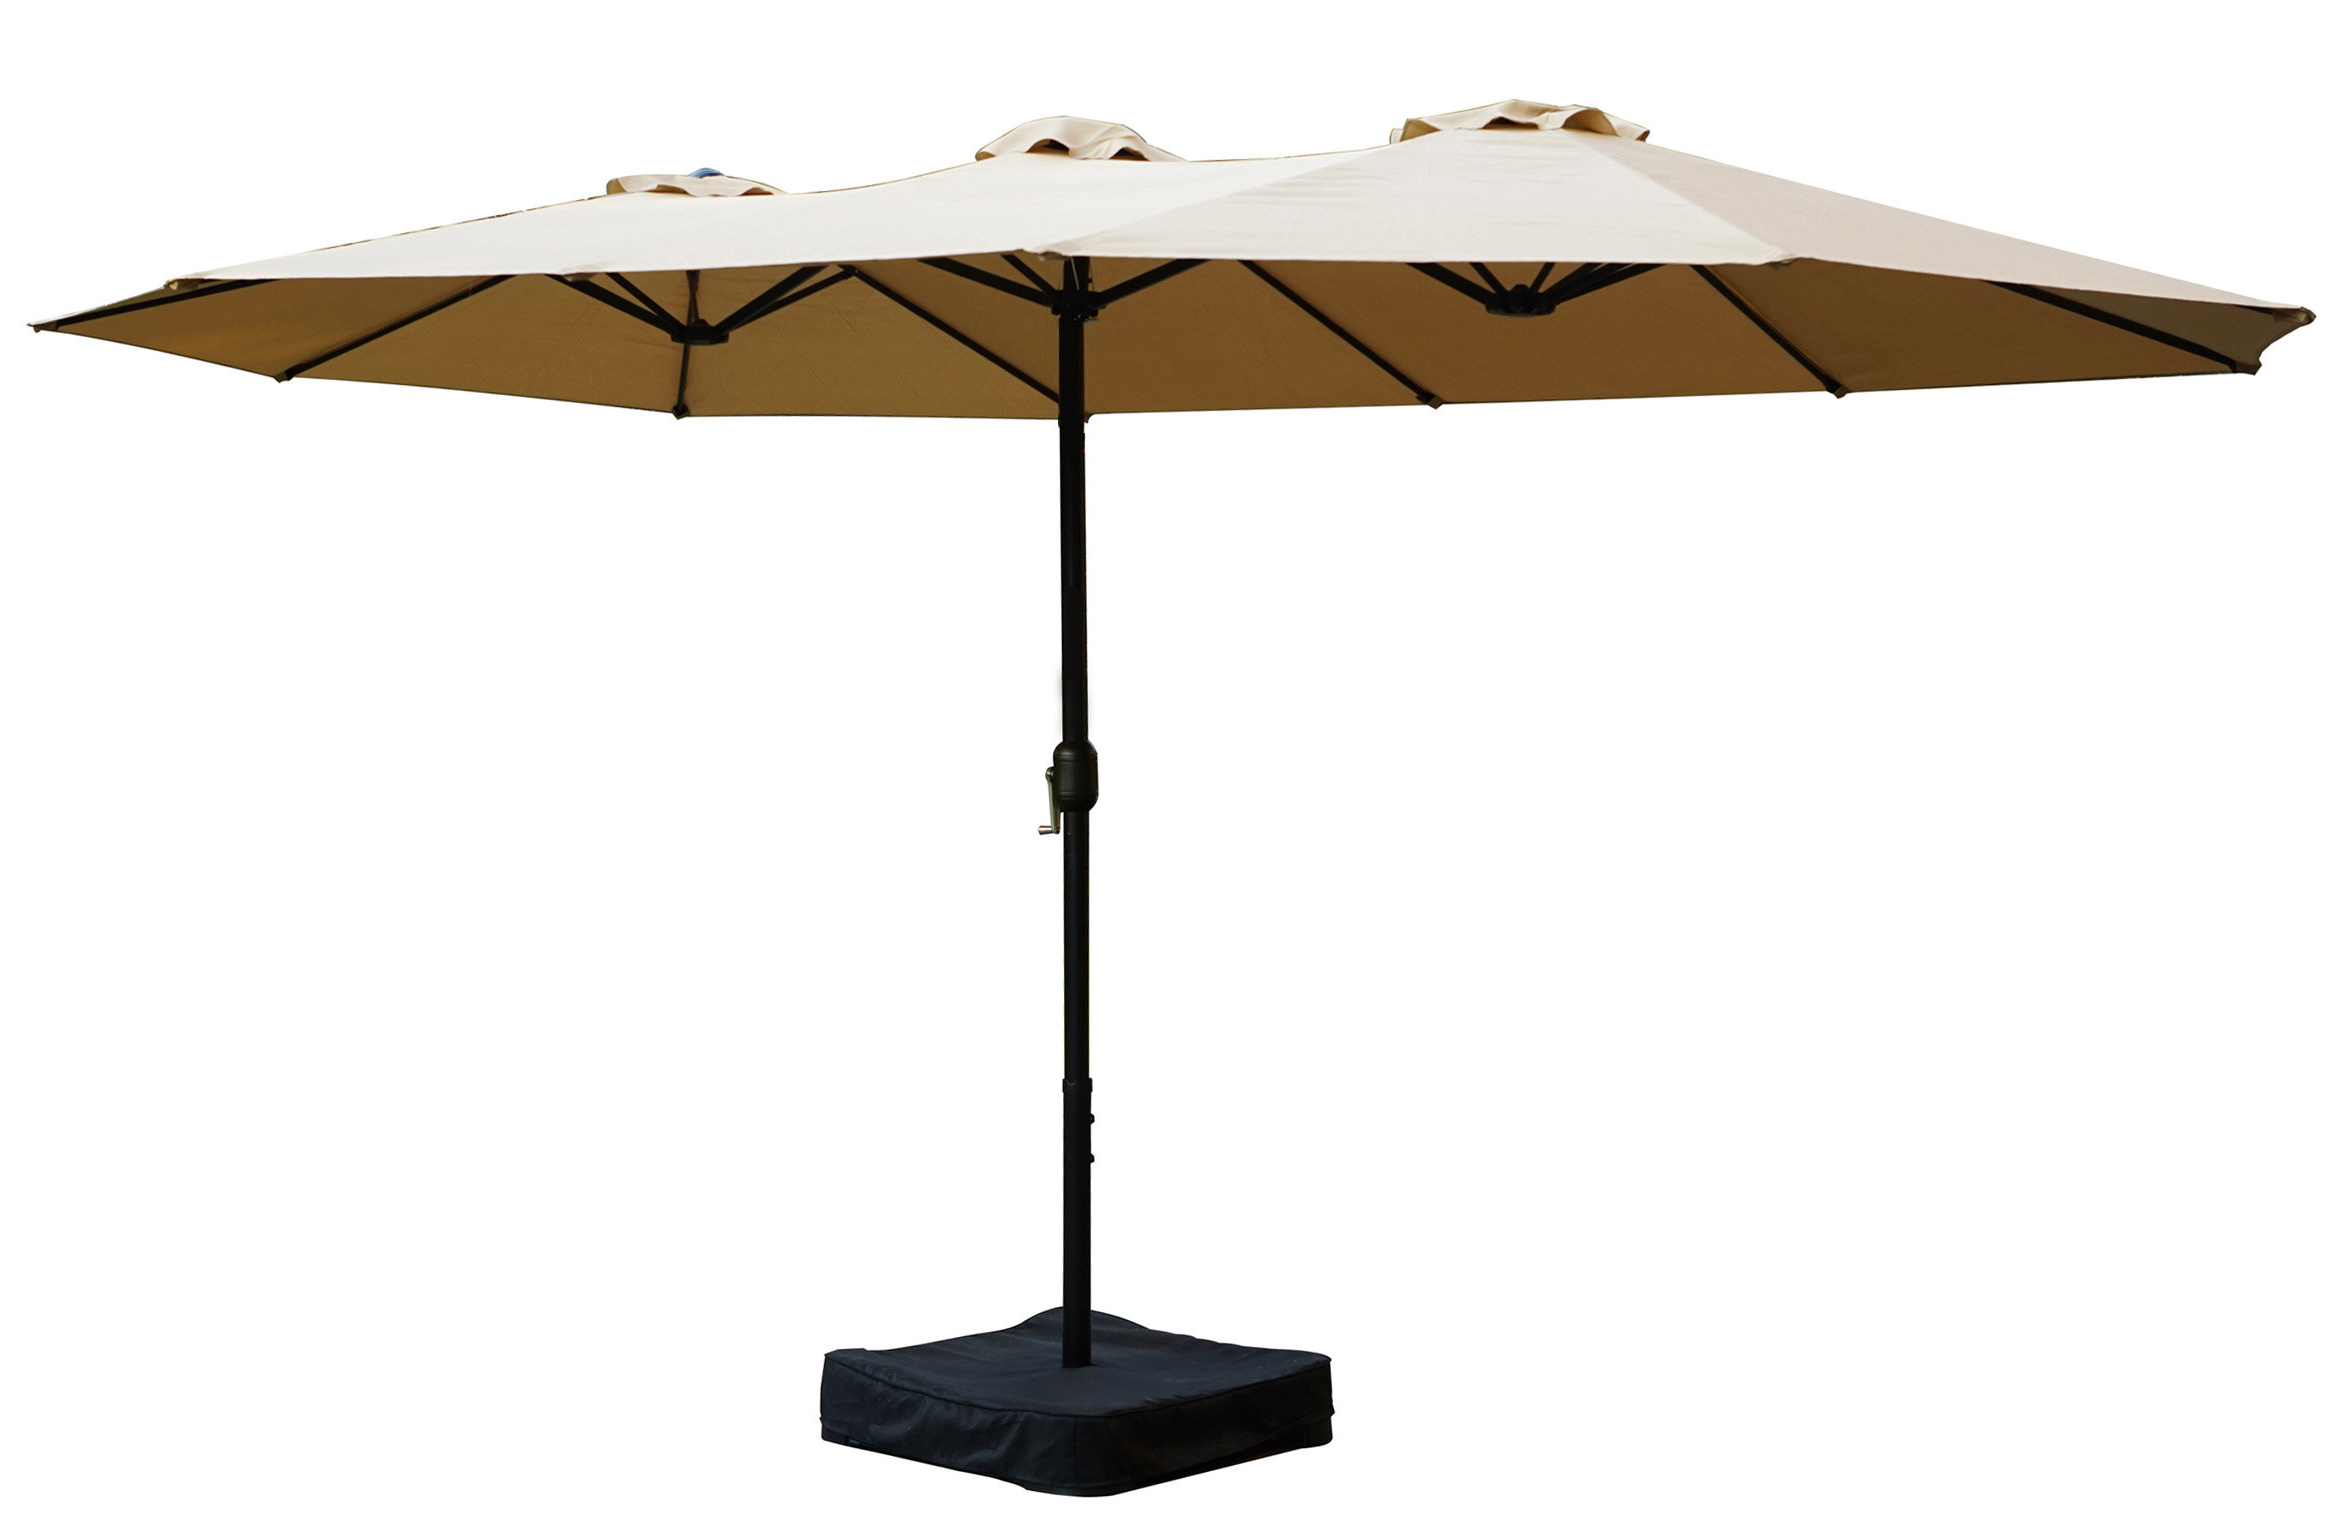 Home Loft Concepts 10' Monti Cantilever Umbrella (Gallery 14 of 20)